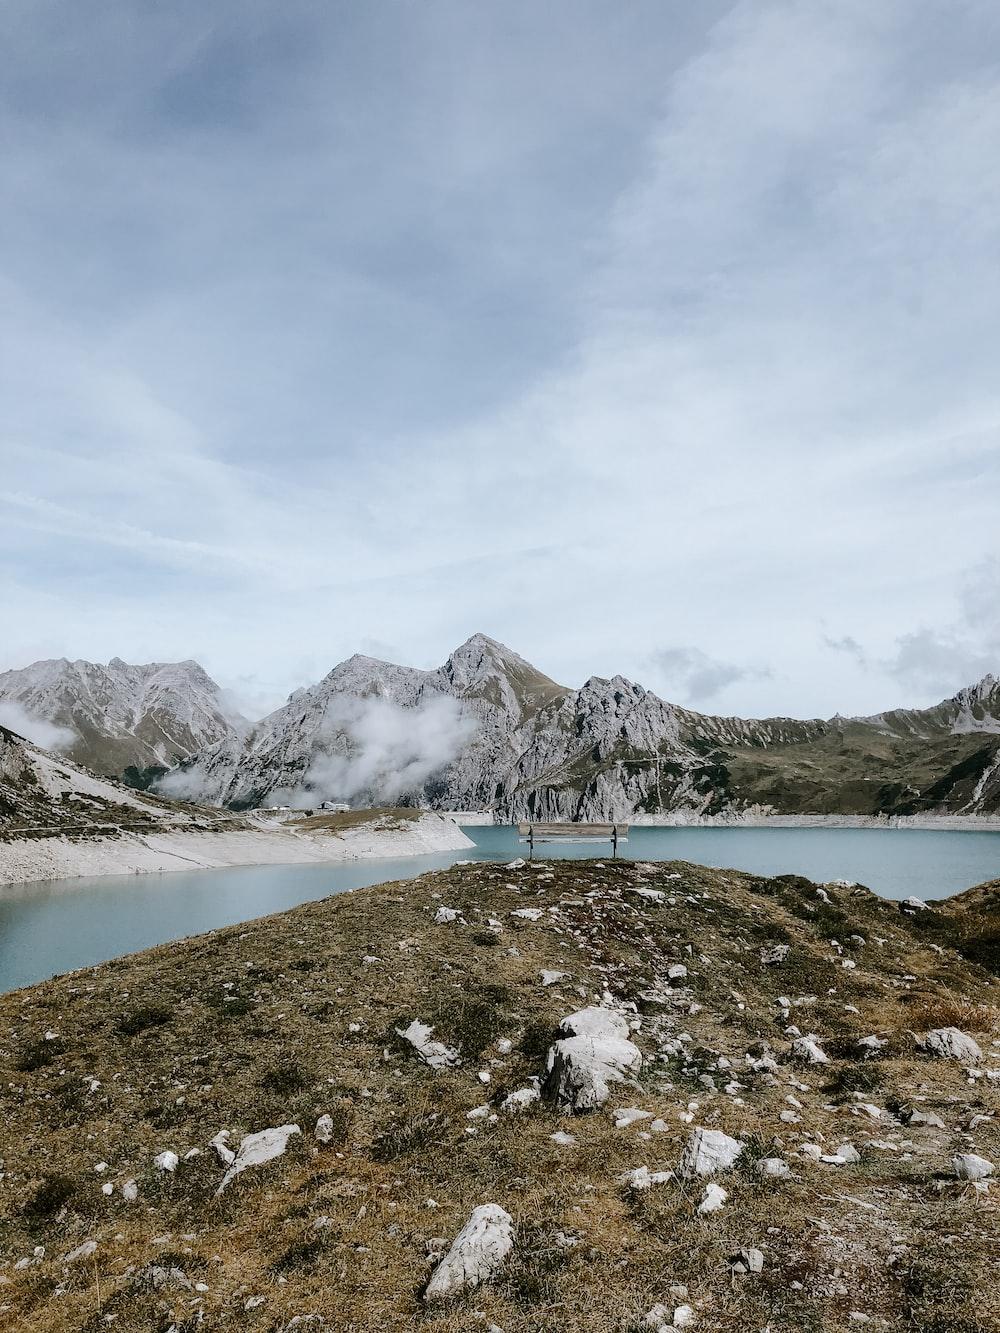 lake near mountains